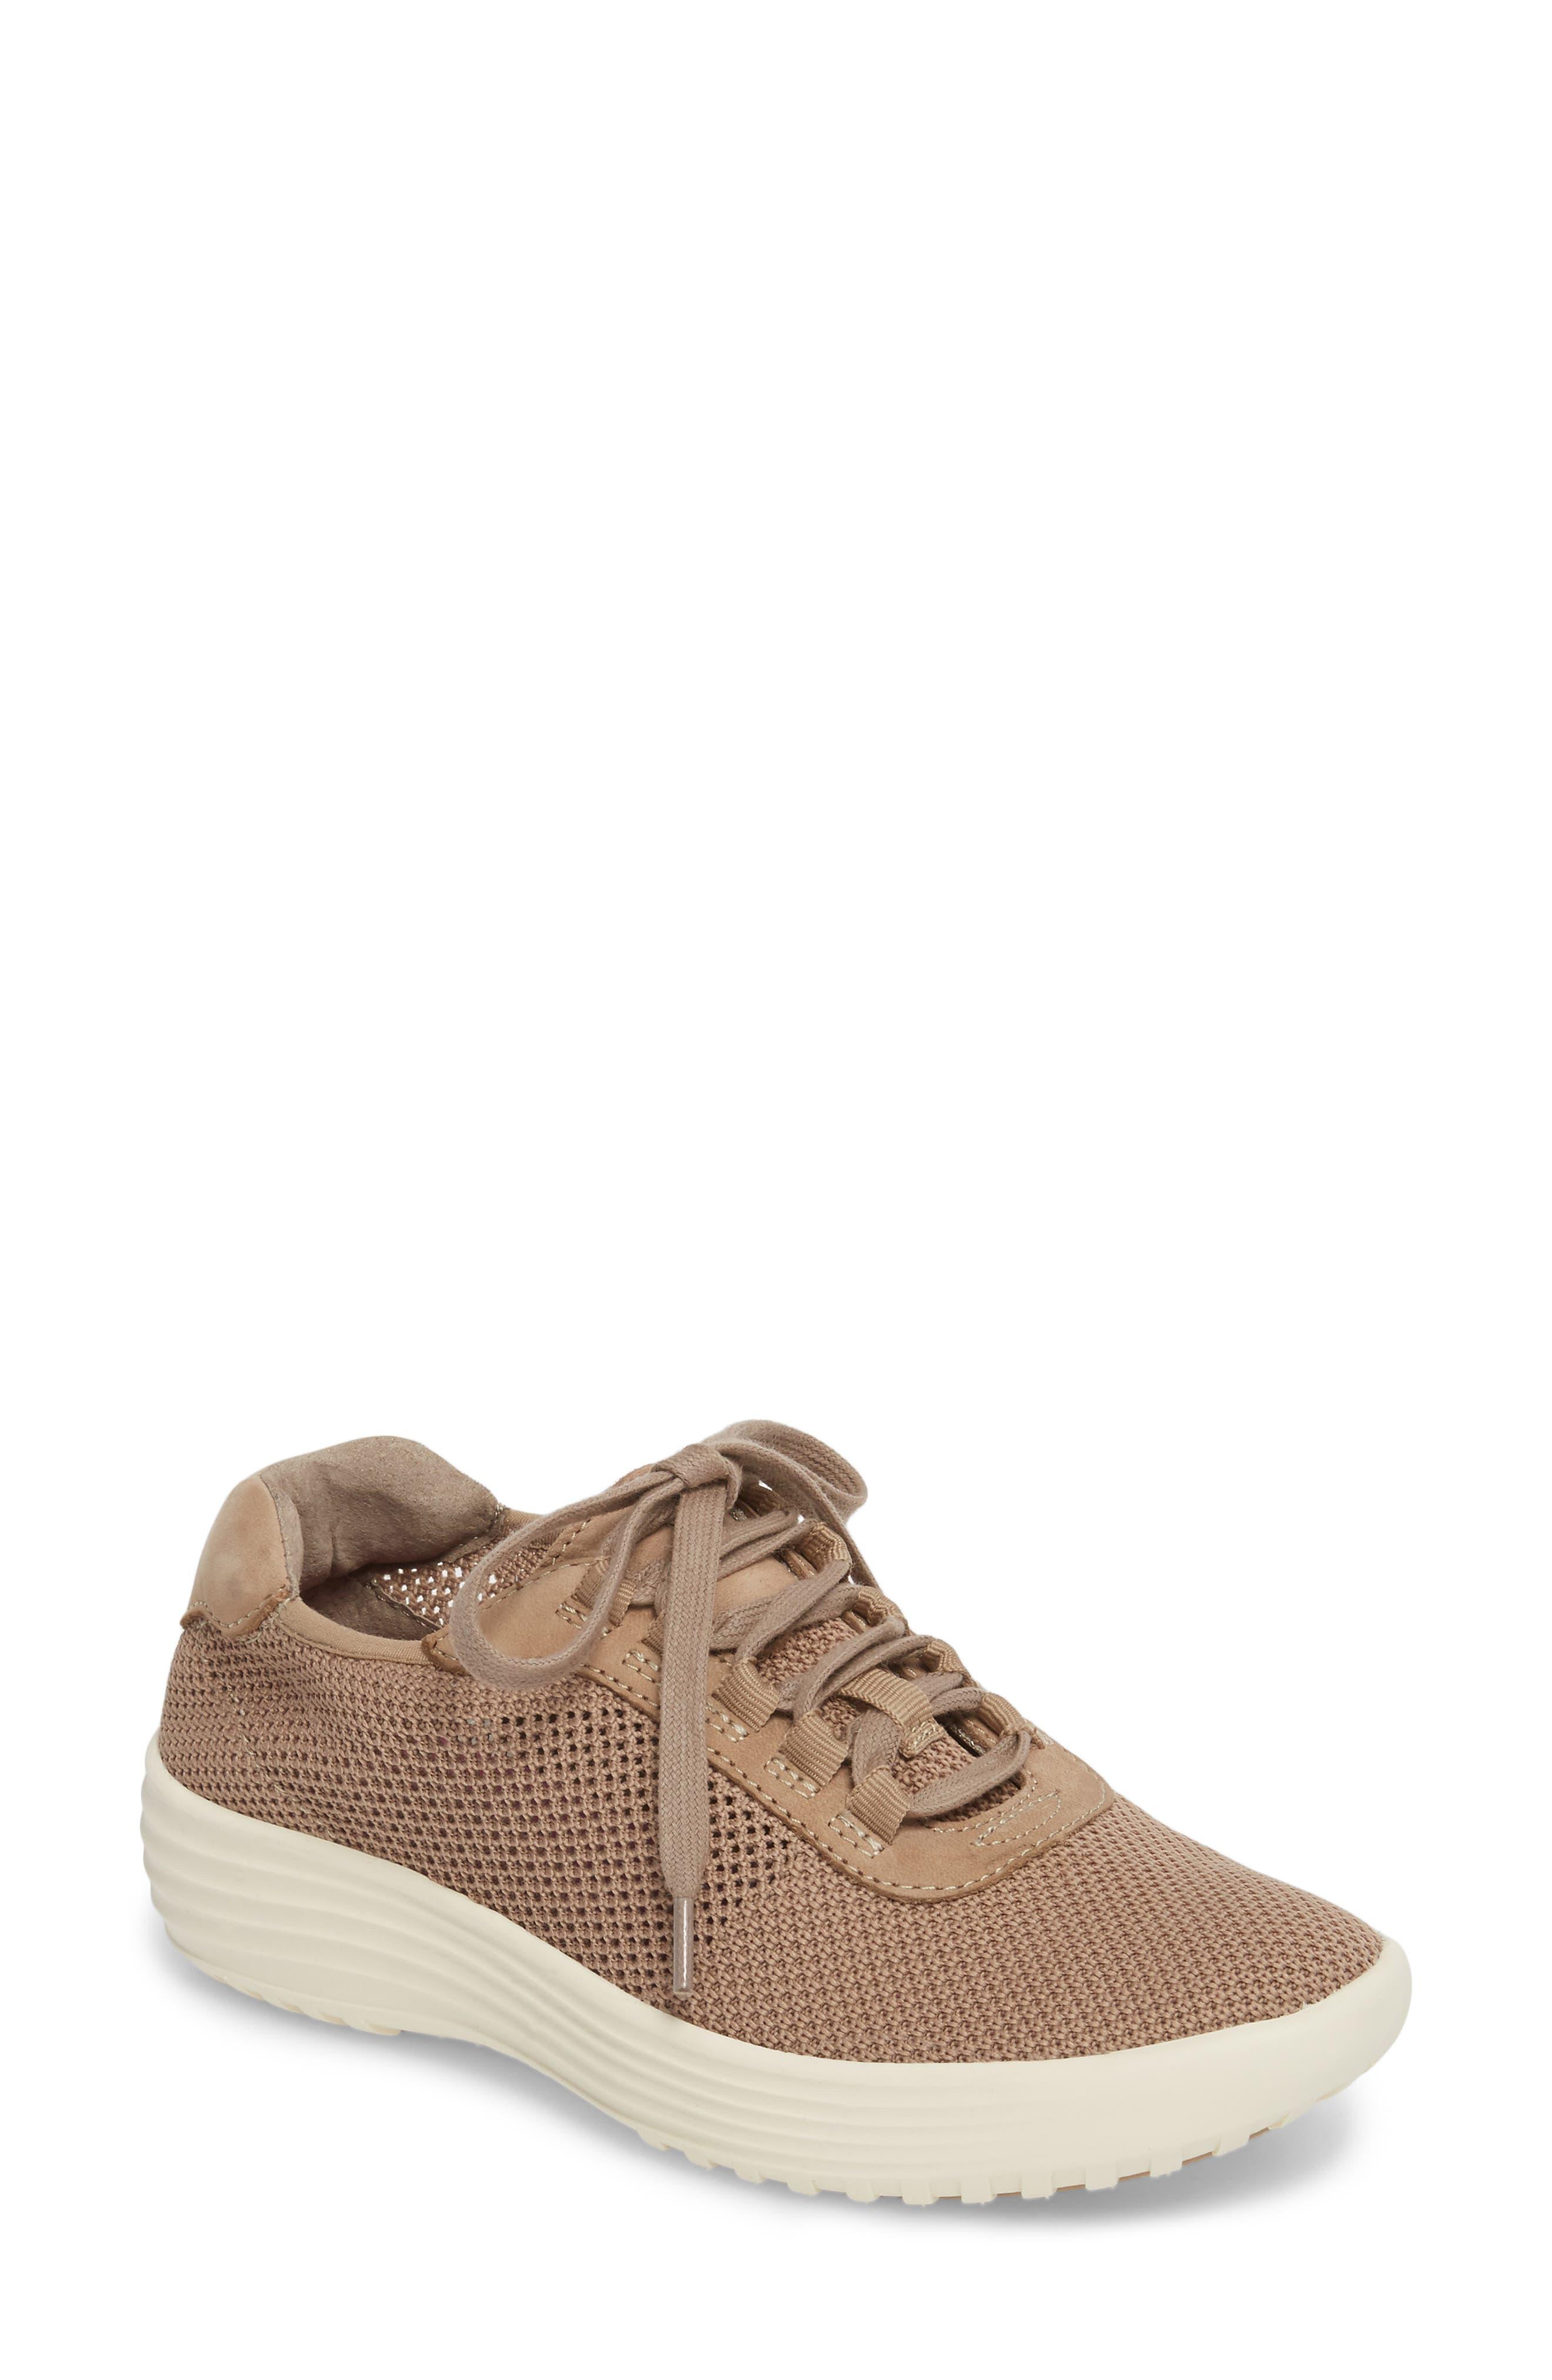 Bionica Malibu Sneaker, Pink